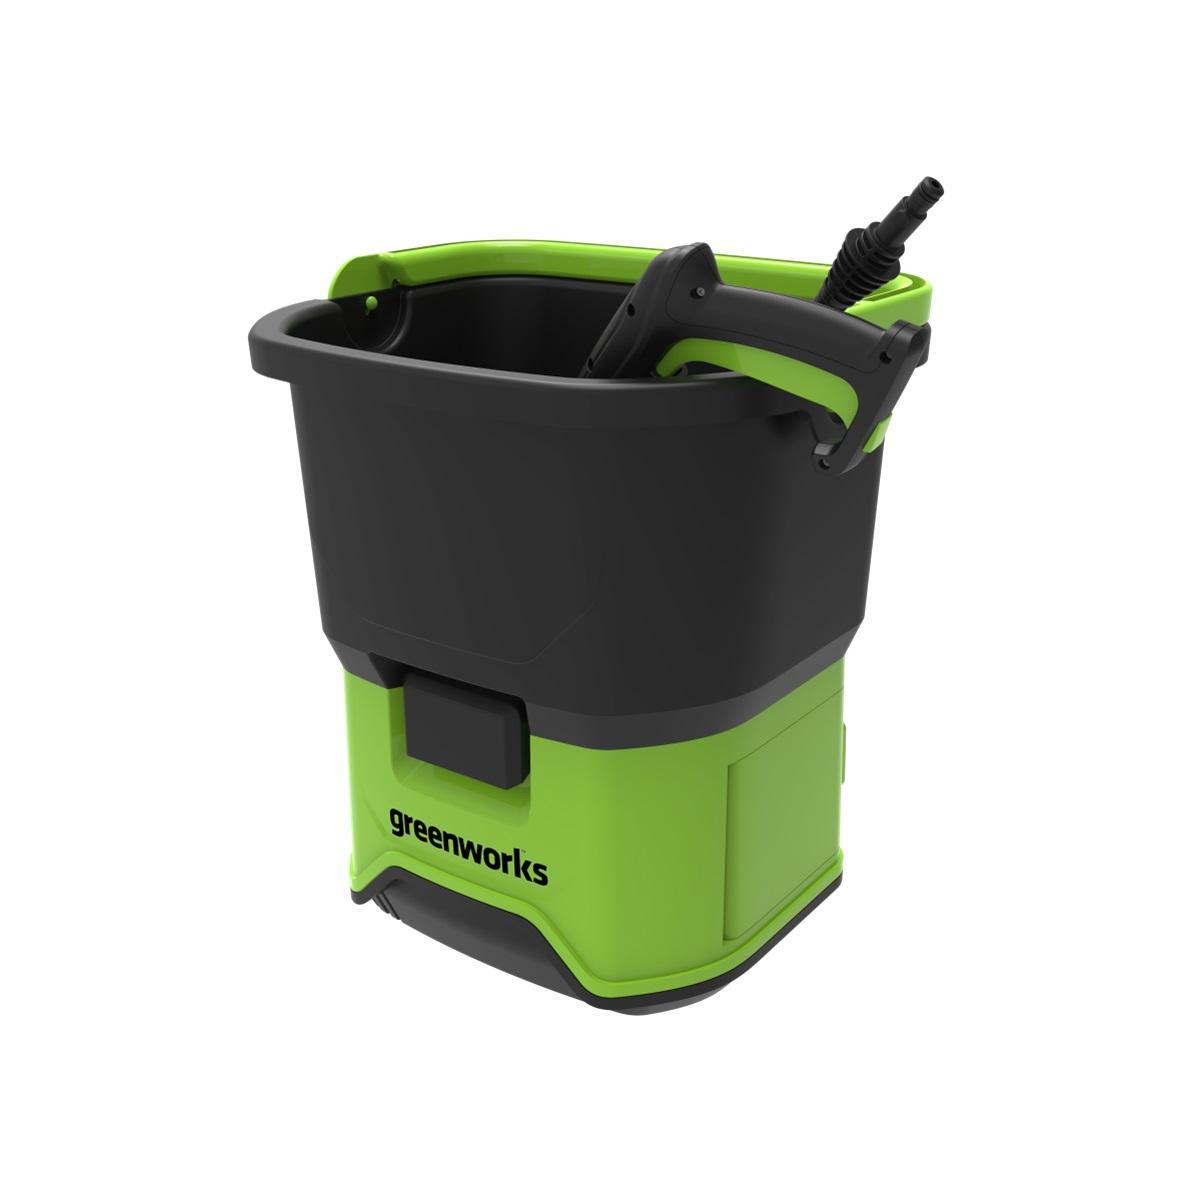 Greenworks GDC60, aku 60 V vysokotlakový čistič 70 bar